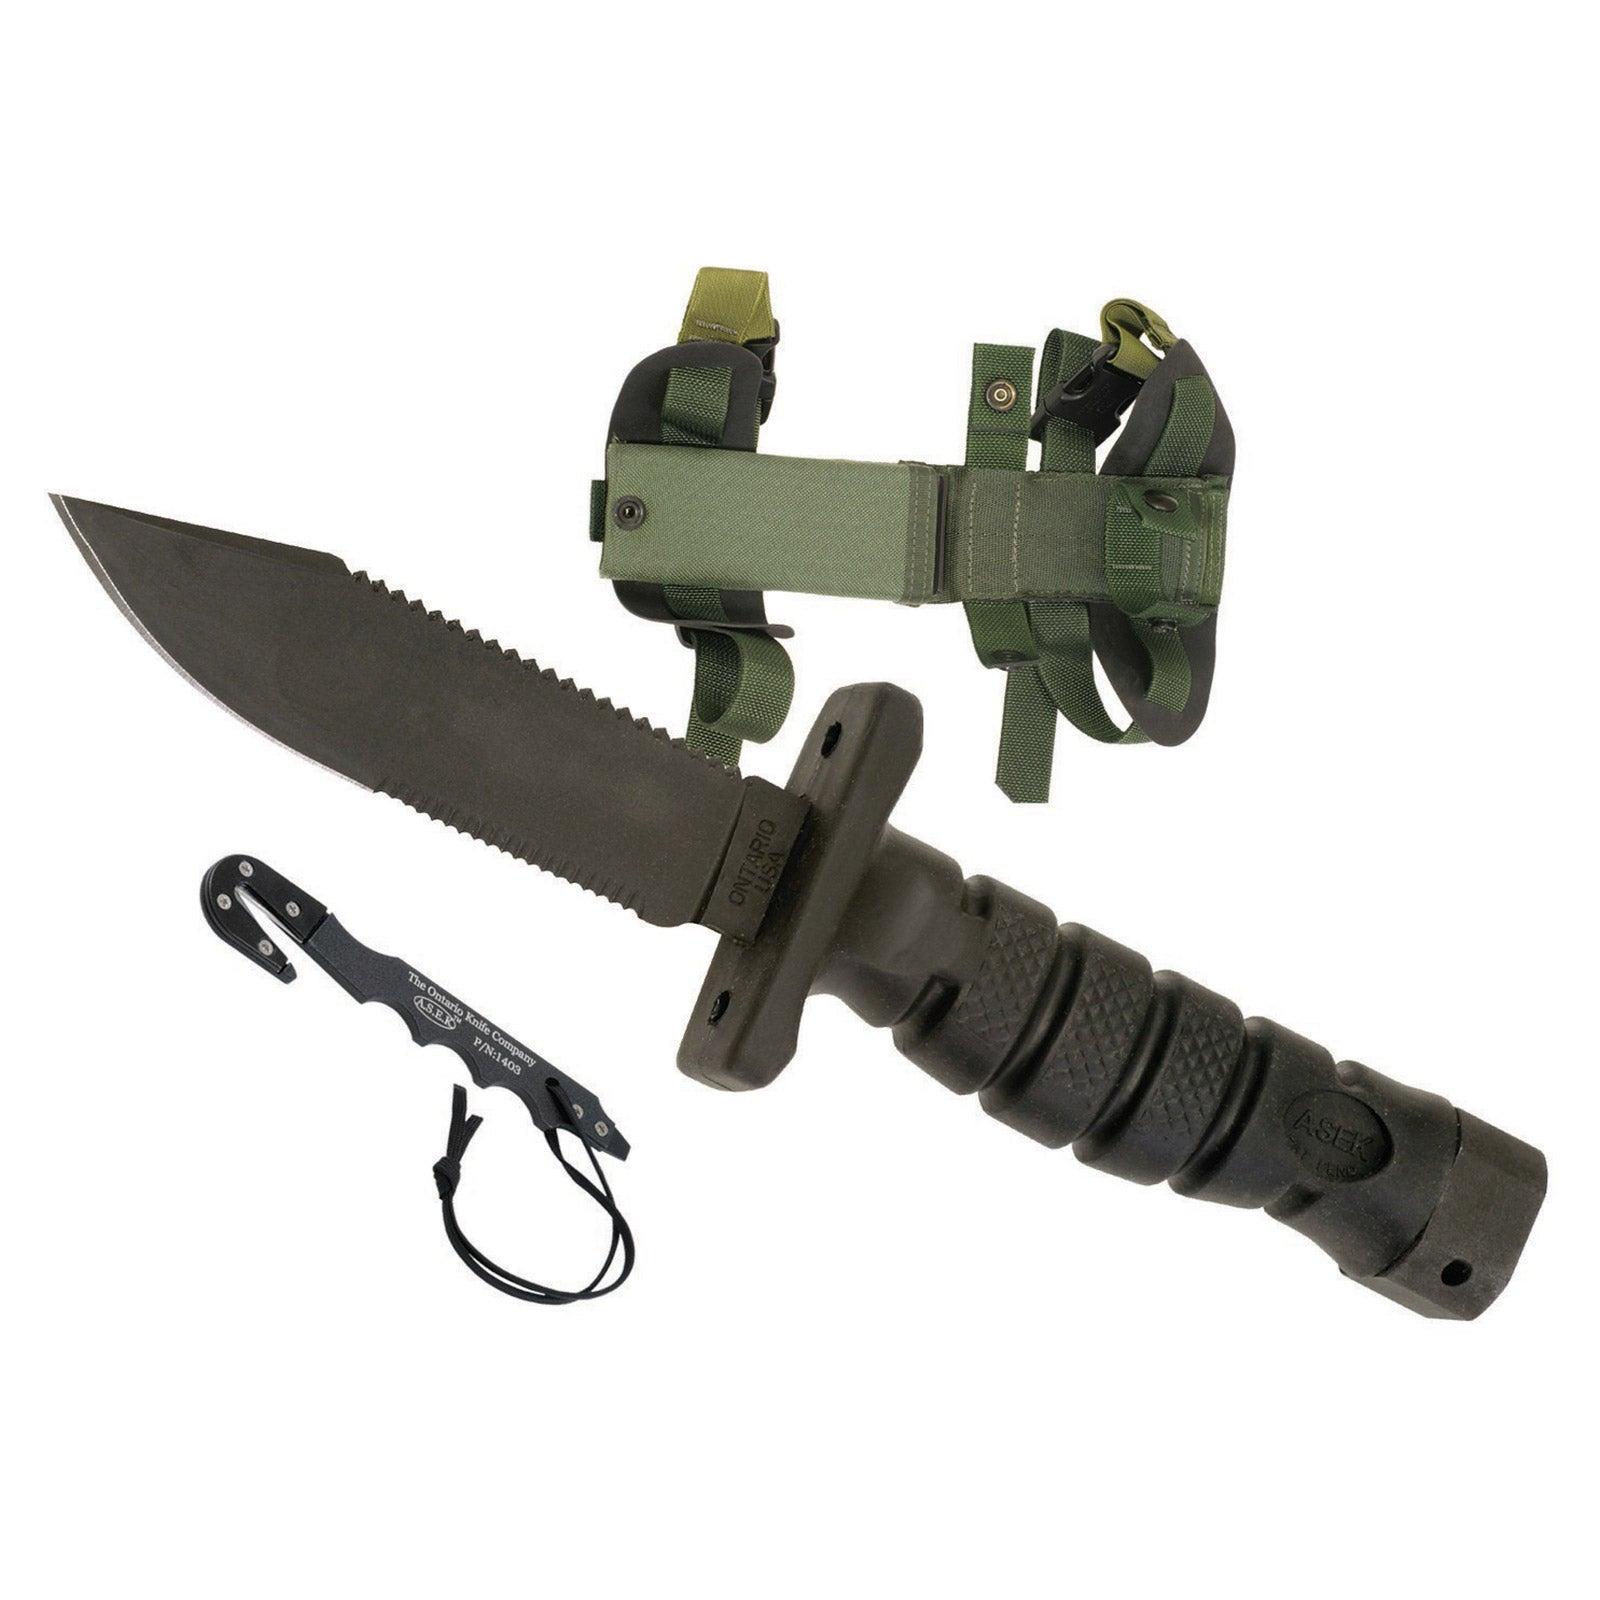 Ontario Knife Co. 1400 ASEK Survival Knife System